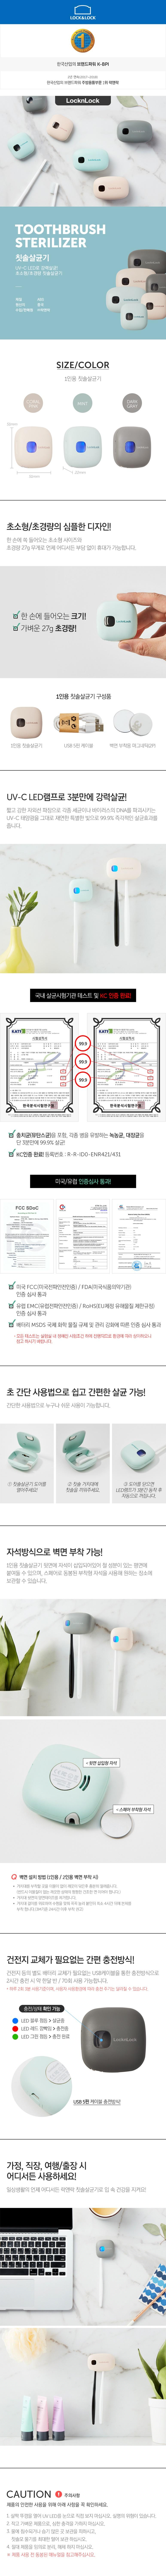 e0fc1970f4c048b08f53e69bb96056fc_1588743